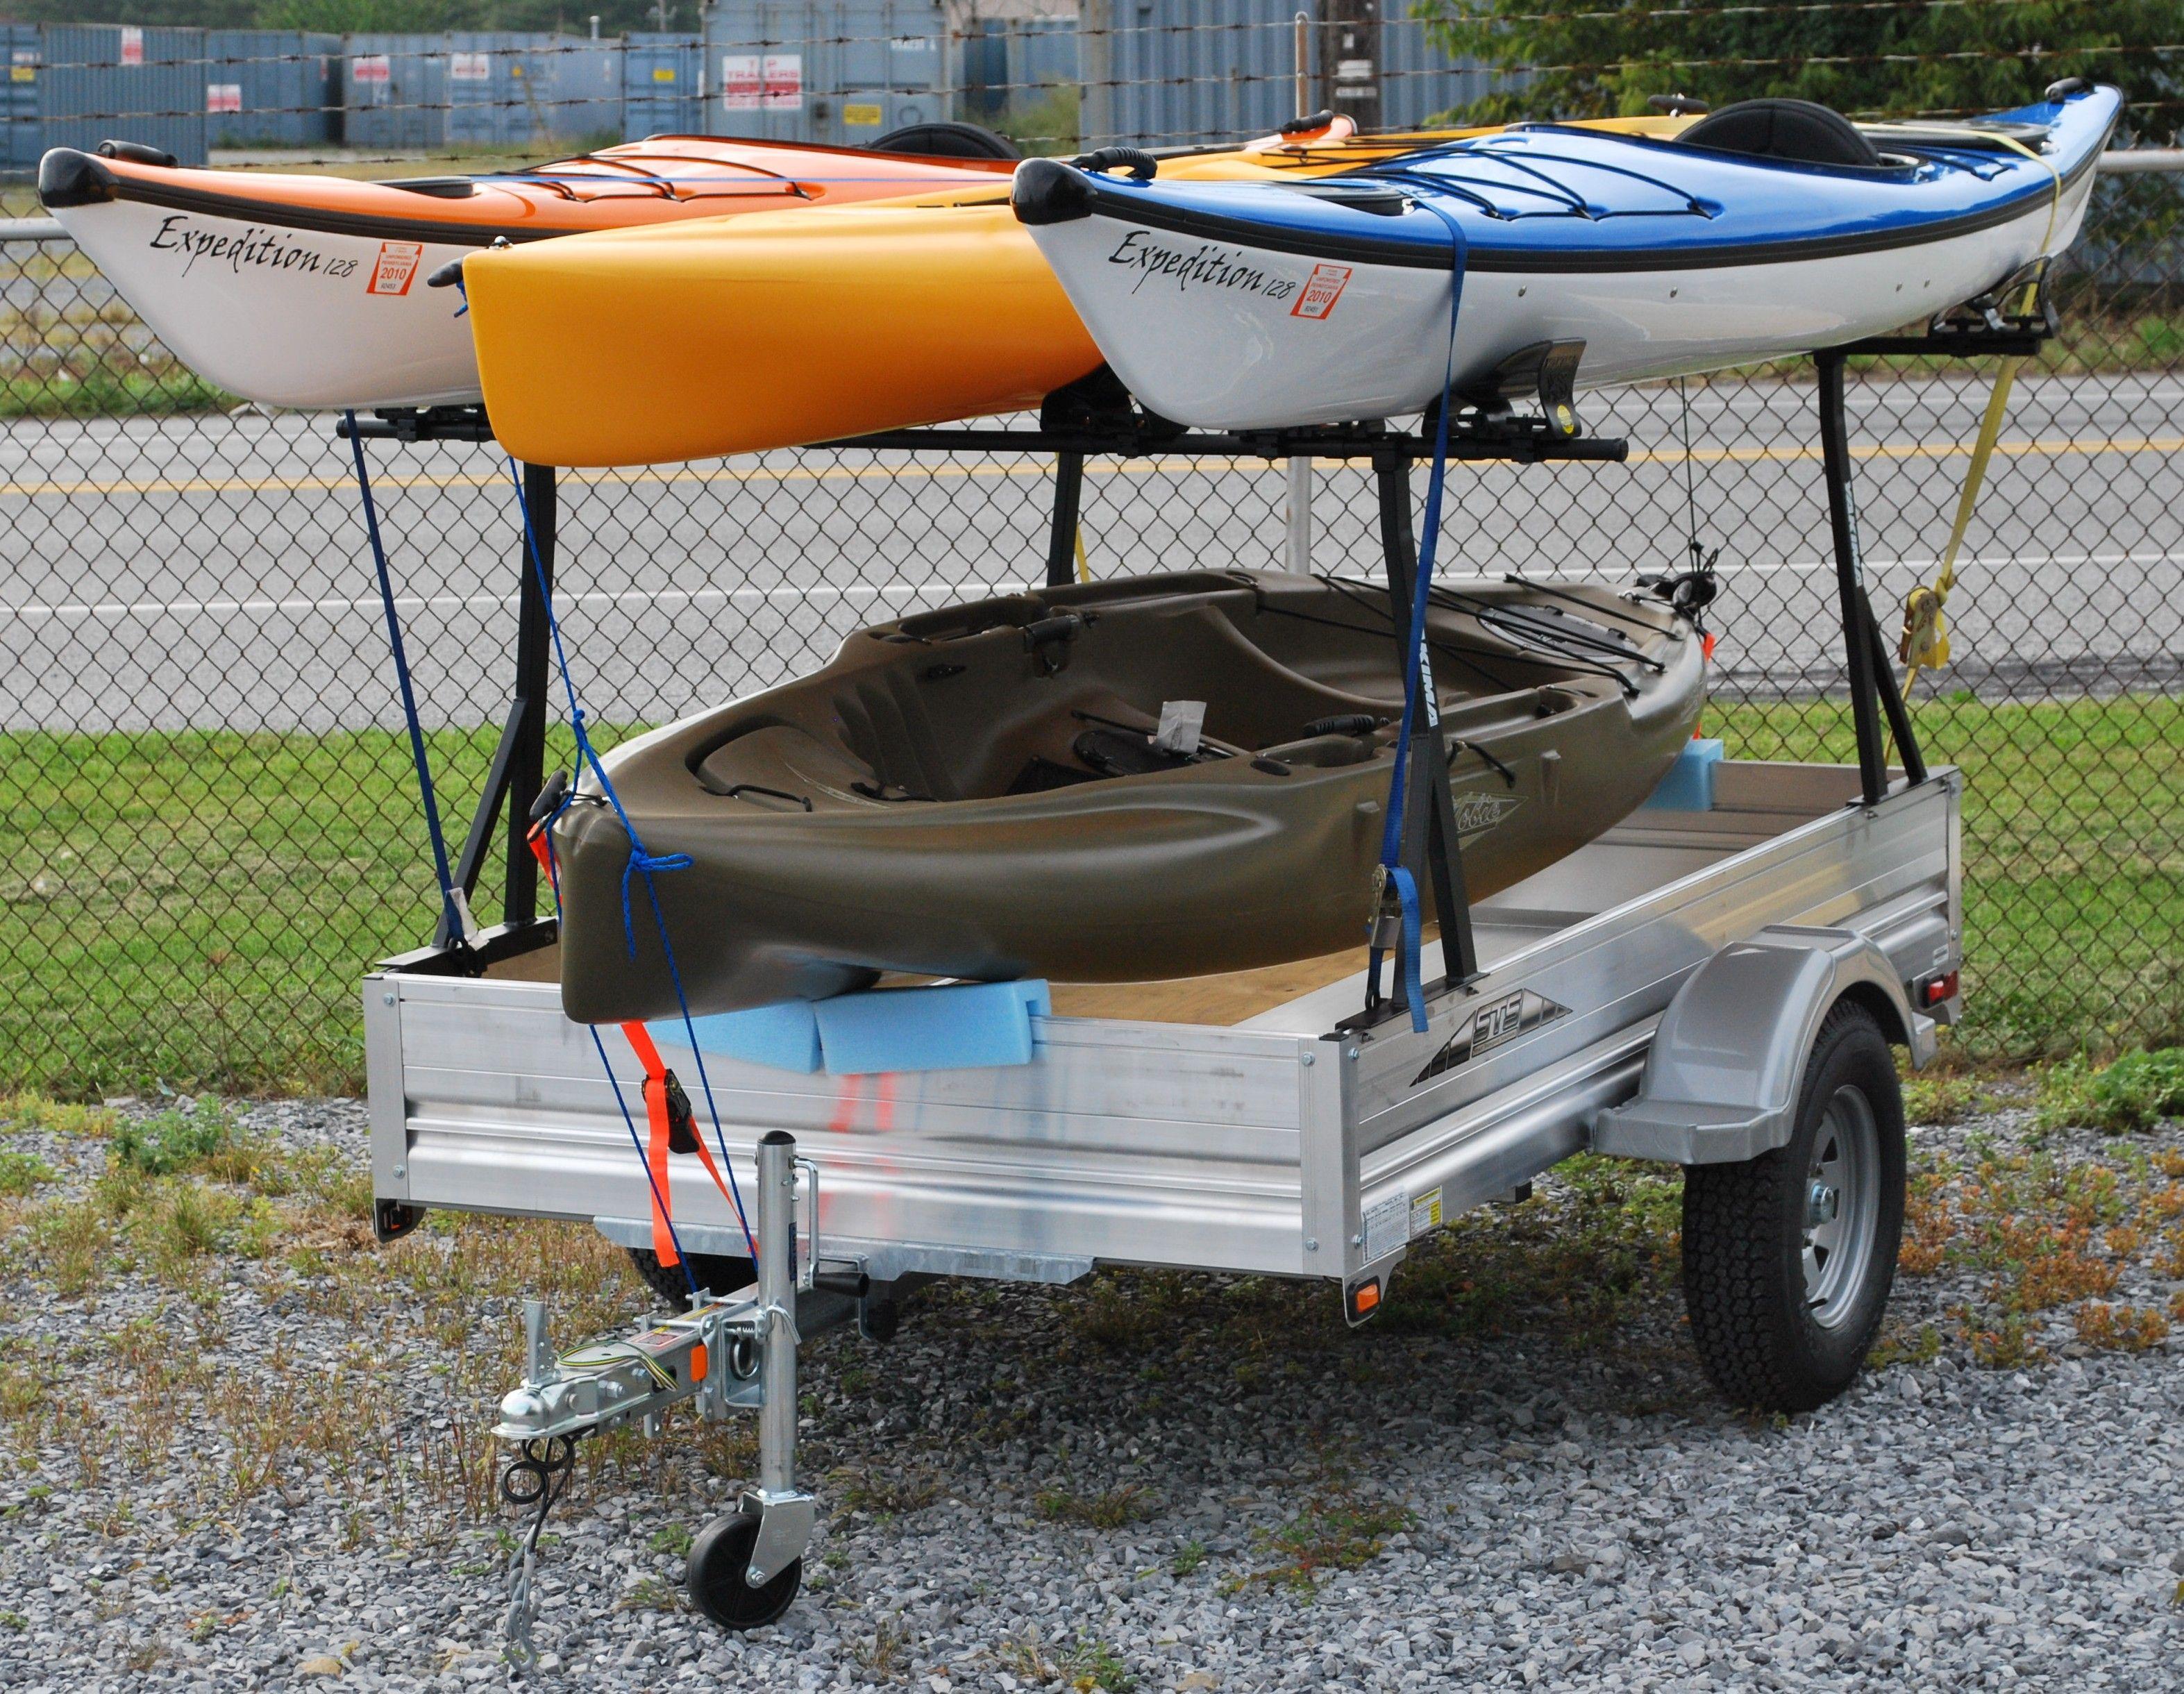 Kayak Trailer Utility Trailer Kayak Carrier Multi